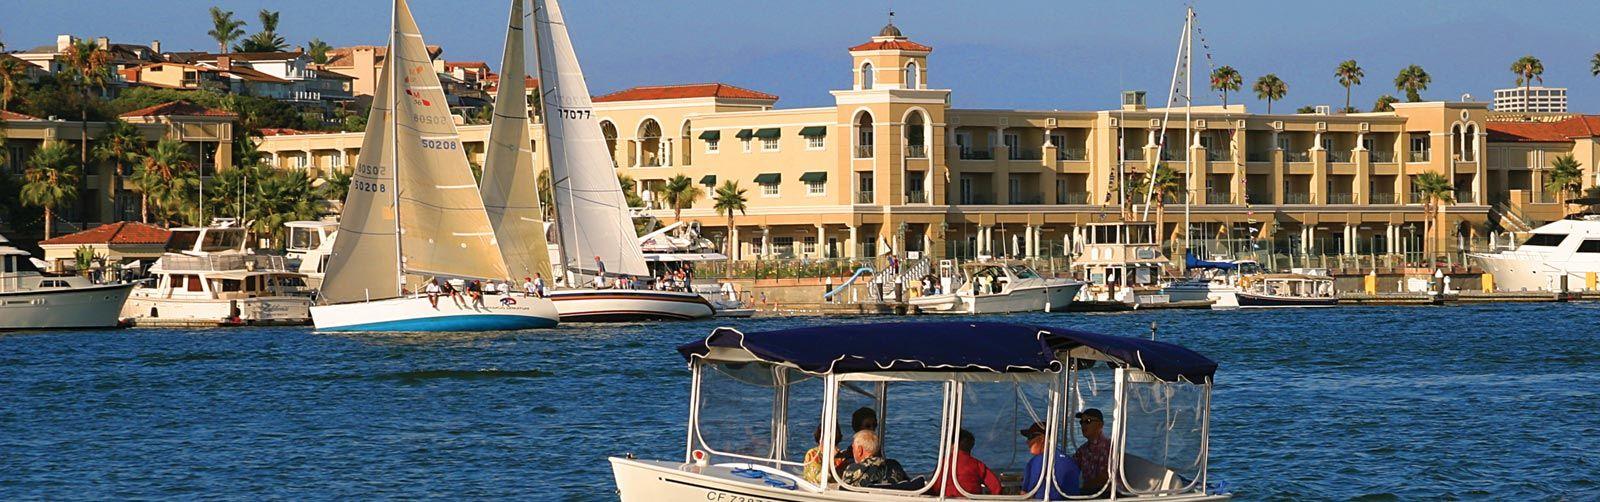 Balboa Bay Resort In Newport Beach